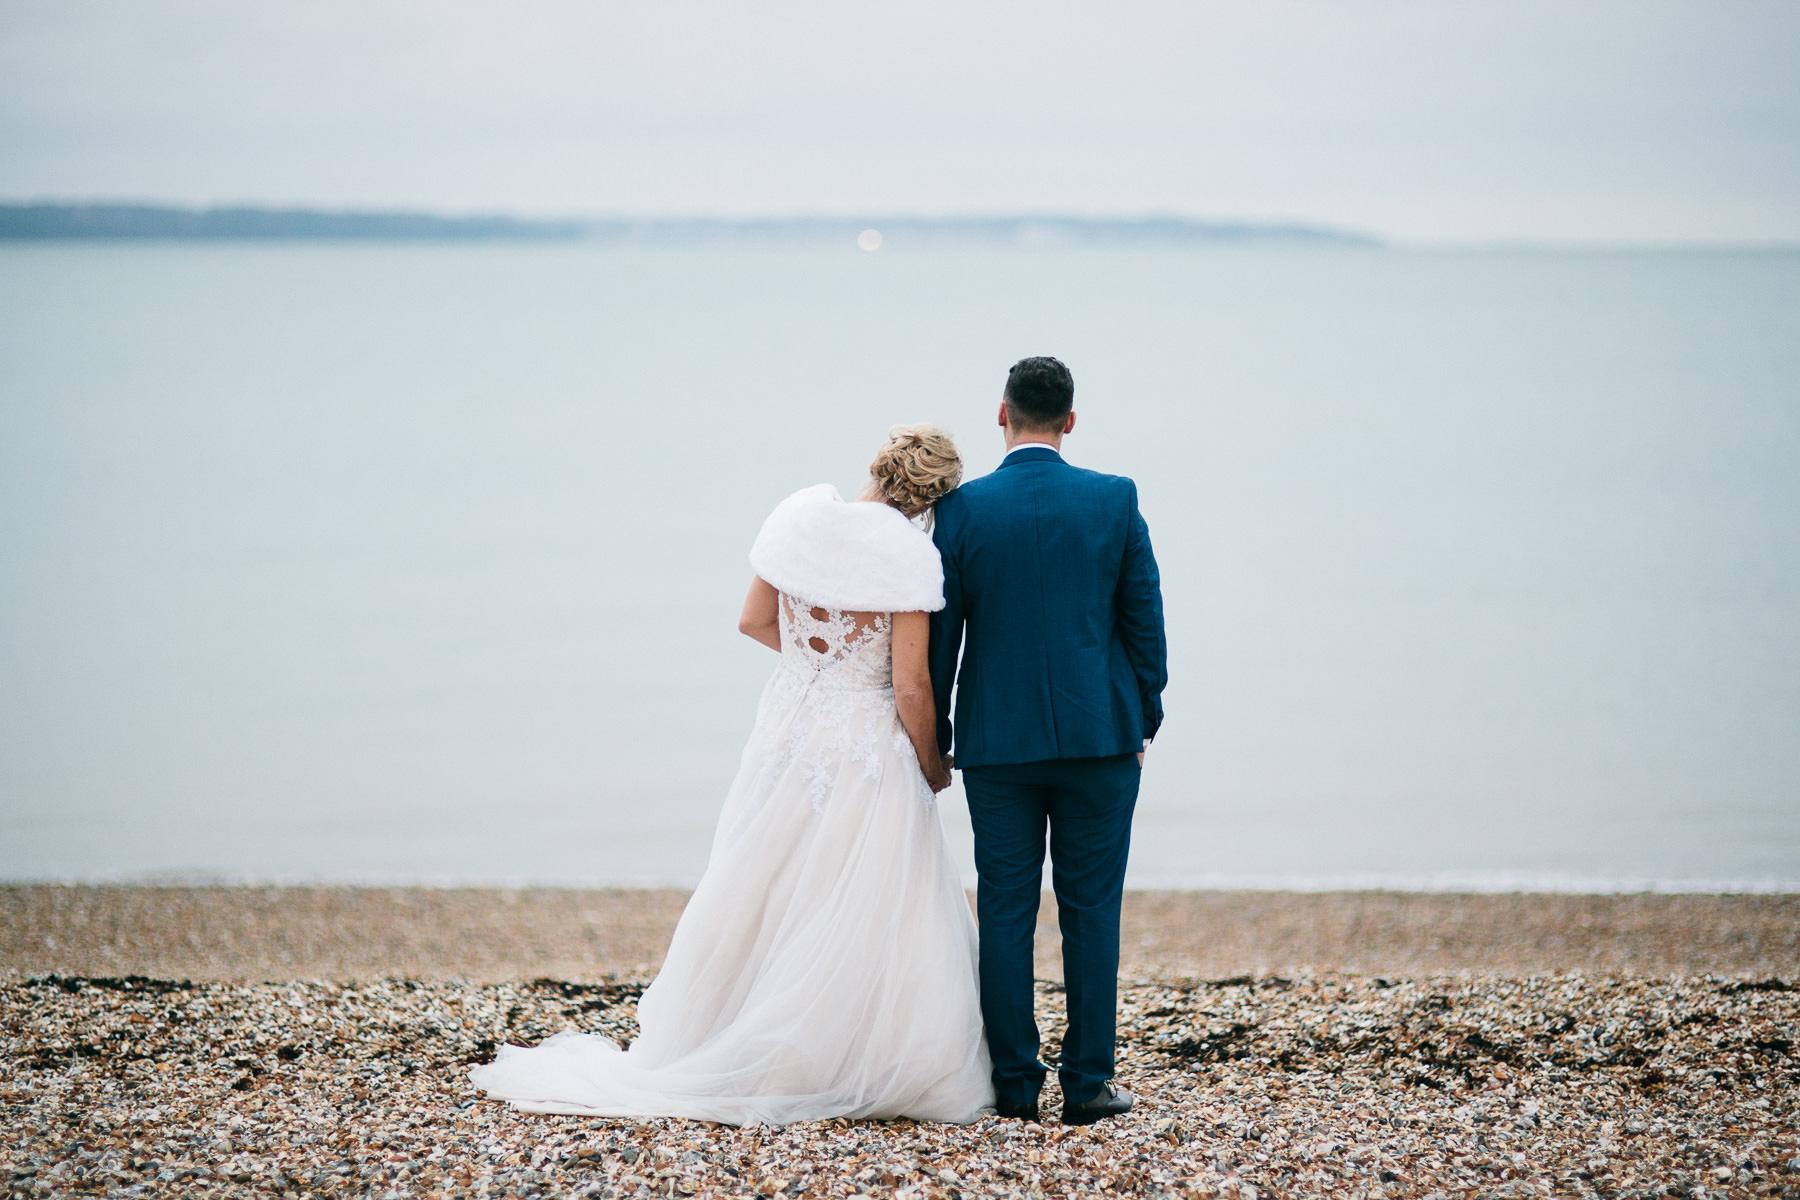 Titchfield-abbey-fareham-registry-wedding-photography-Jessica-and-Lance-web-204